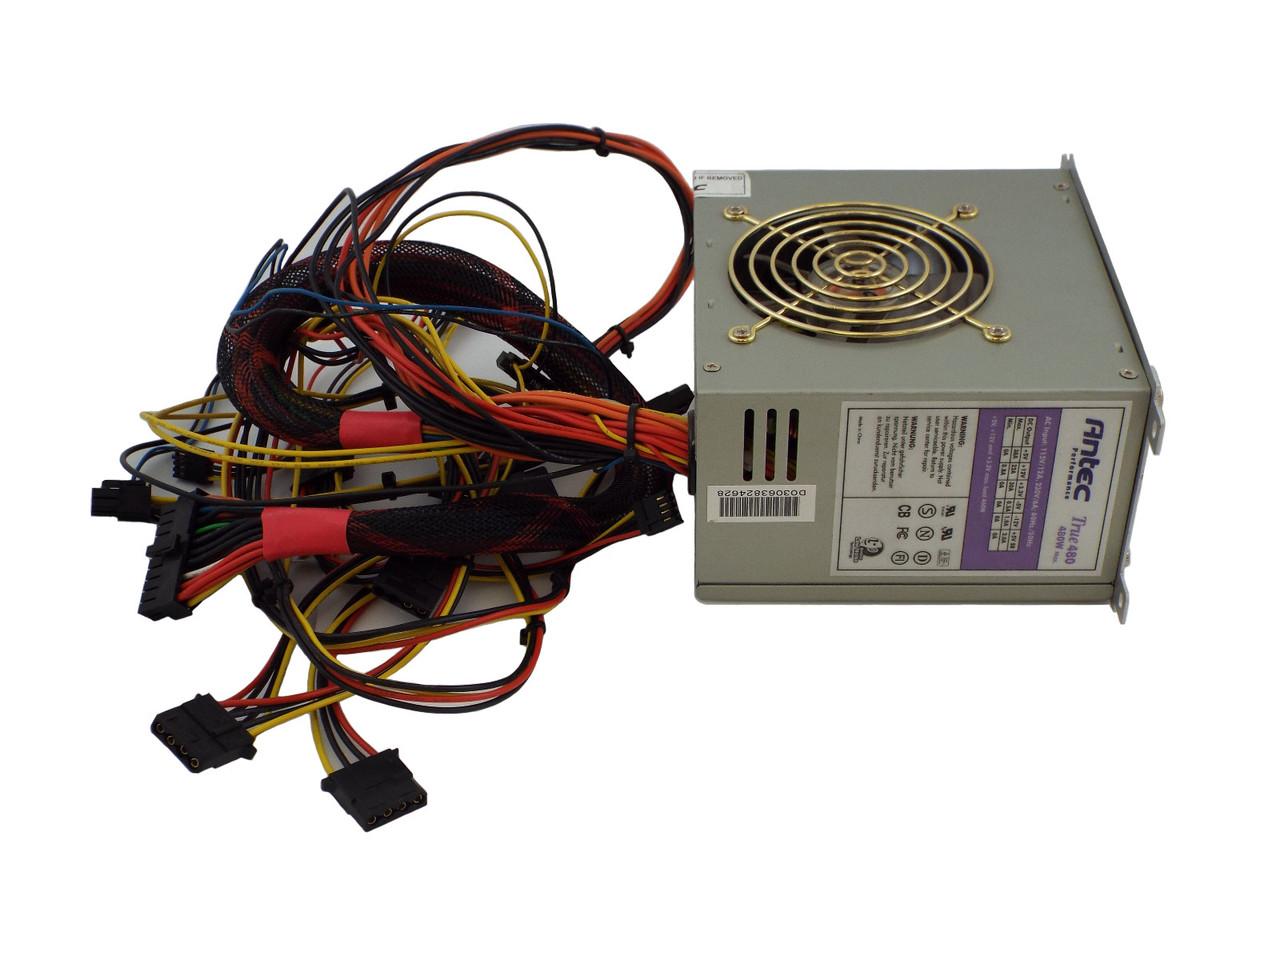 Antec True480 Power Supply 480W